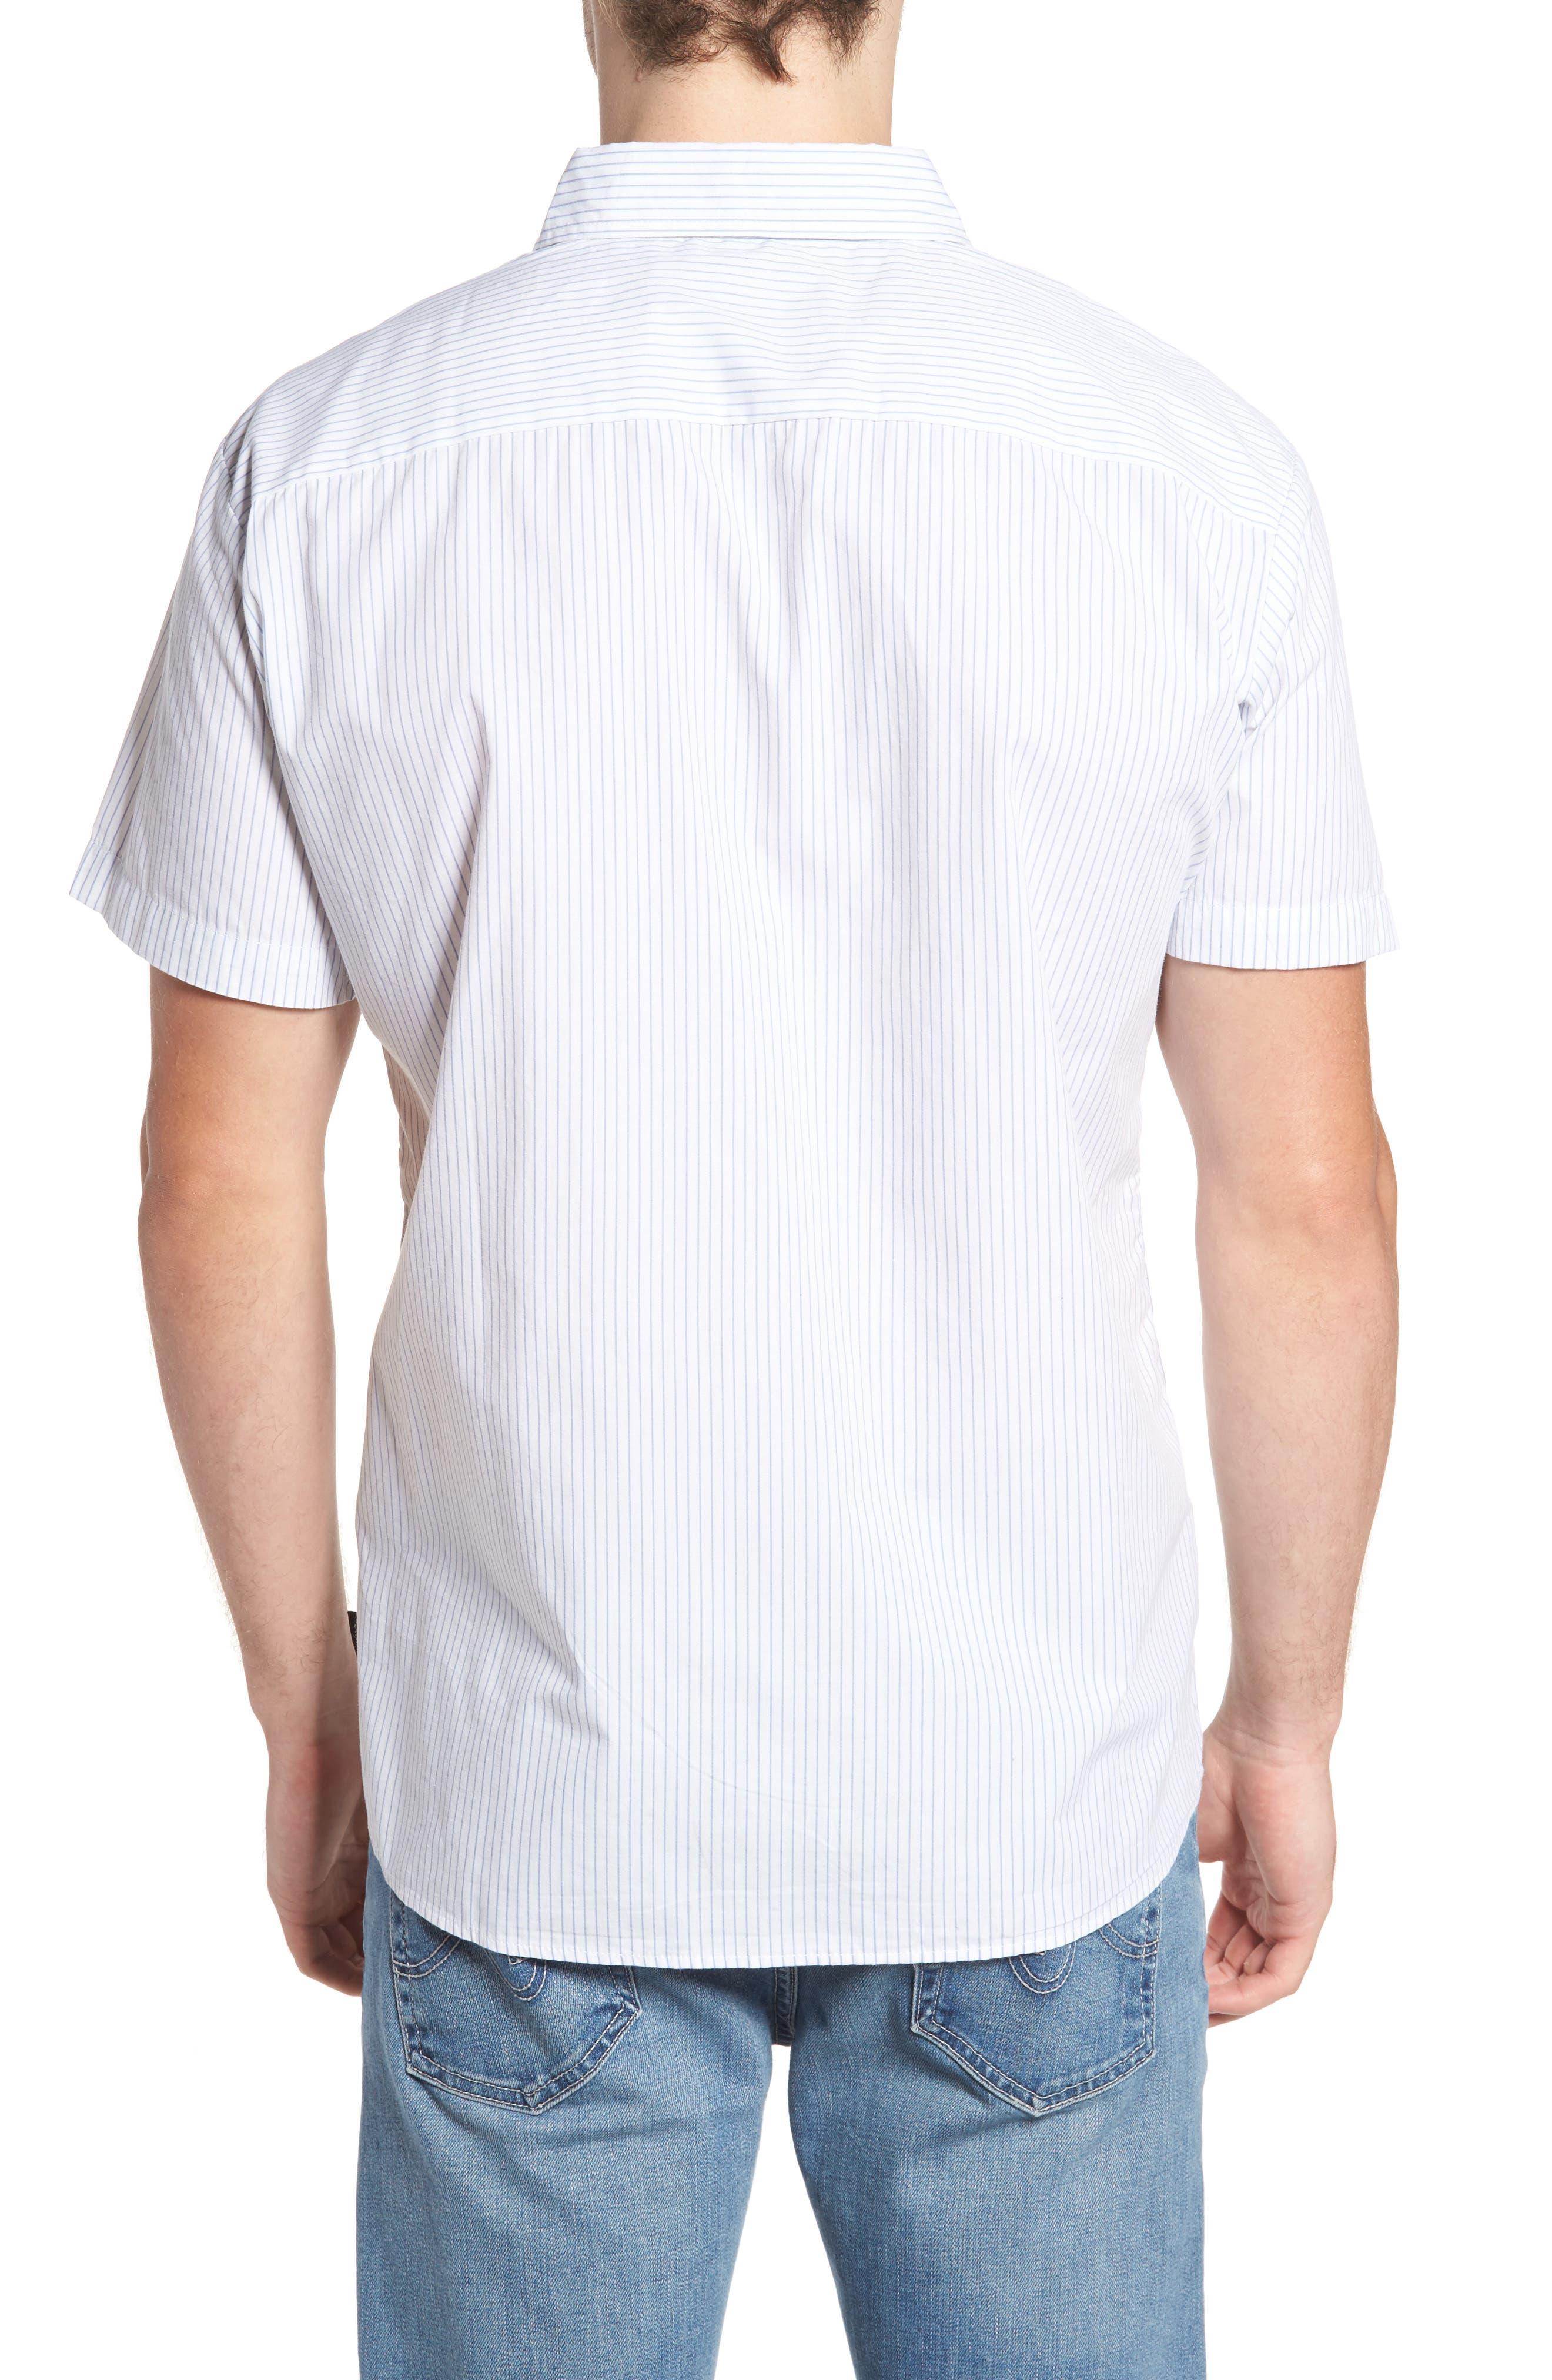 Alternate Image 2  - Brixton Reeve Pinstripe Woven Shirt